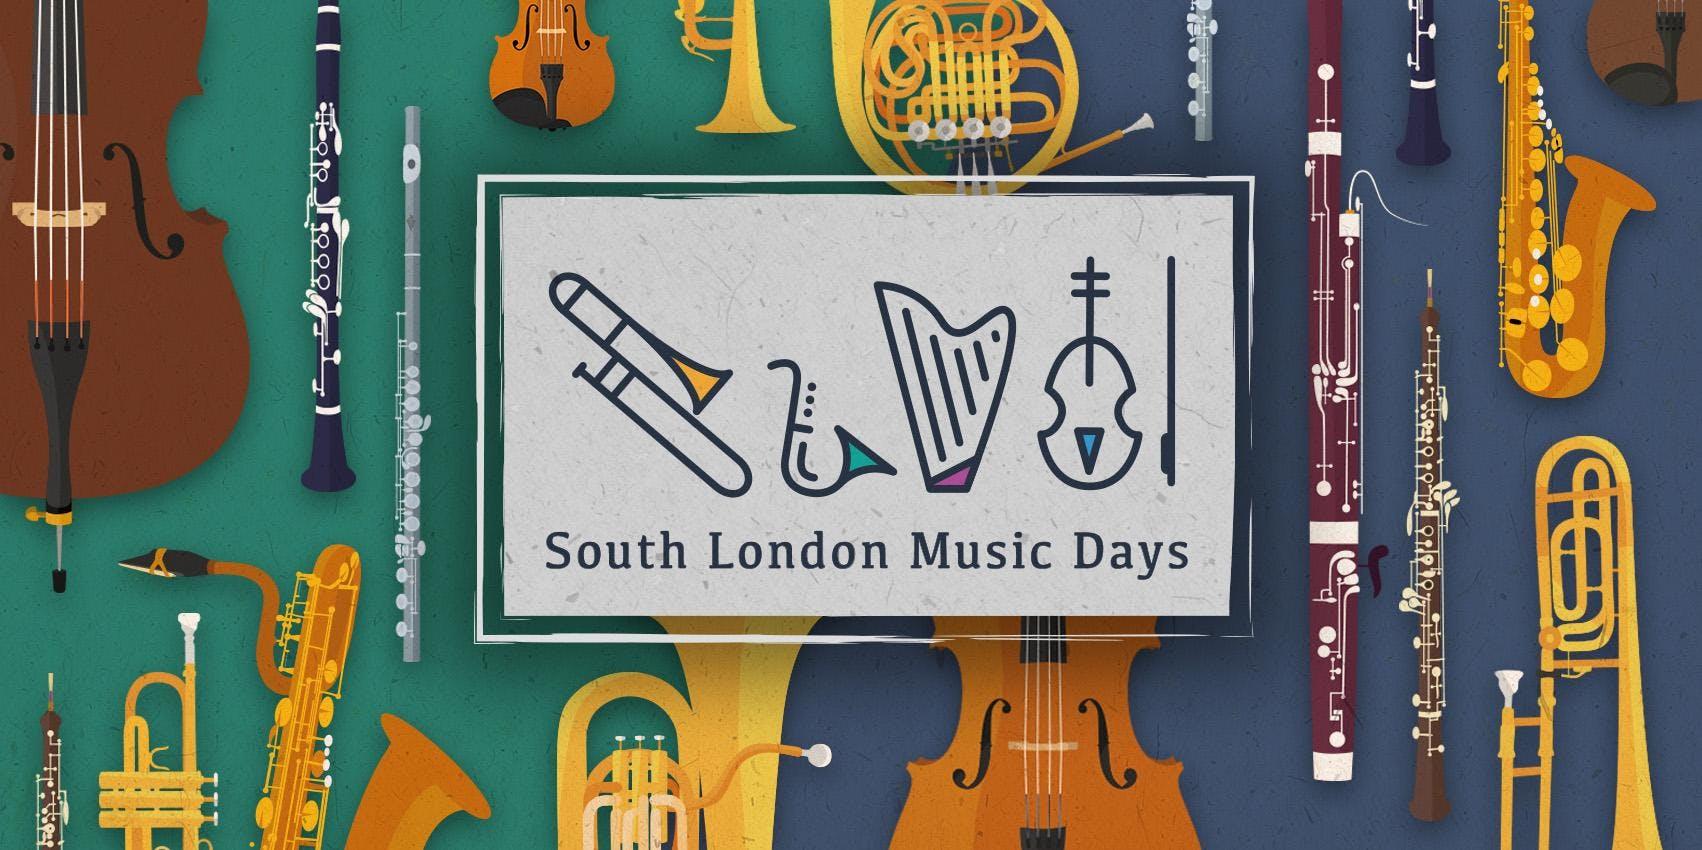 South London Music Days: Summer 2019